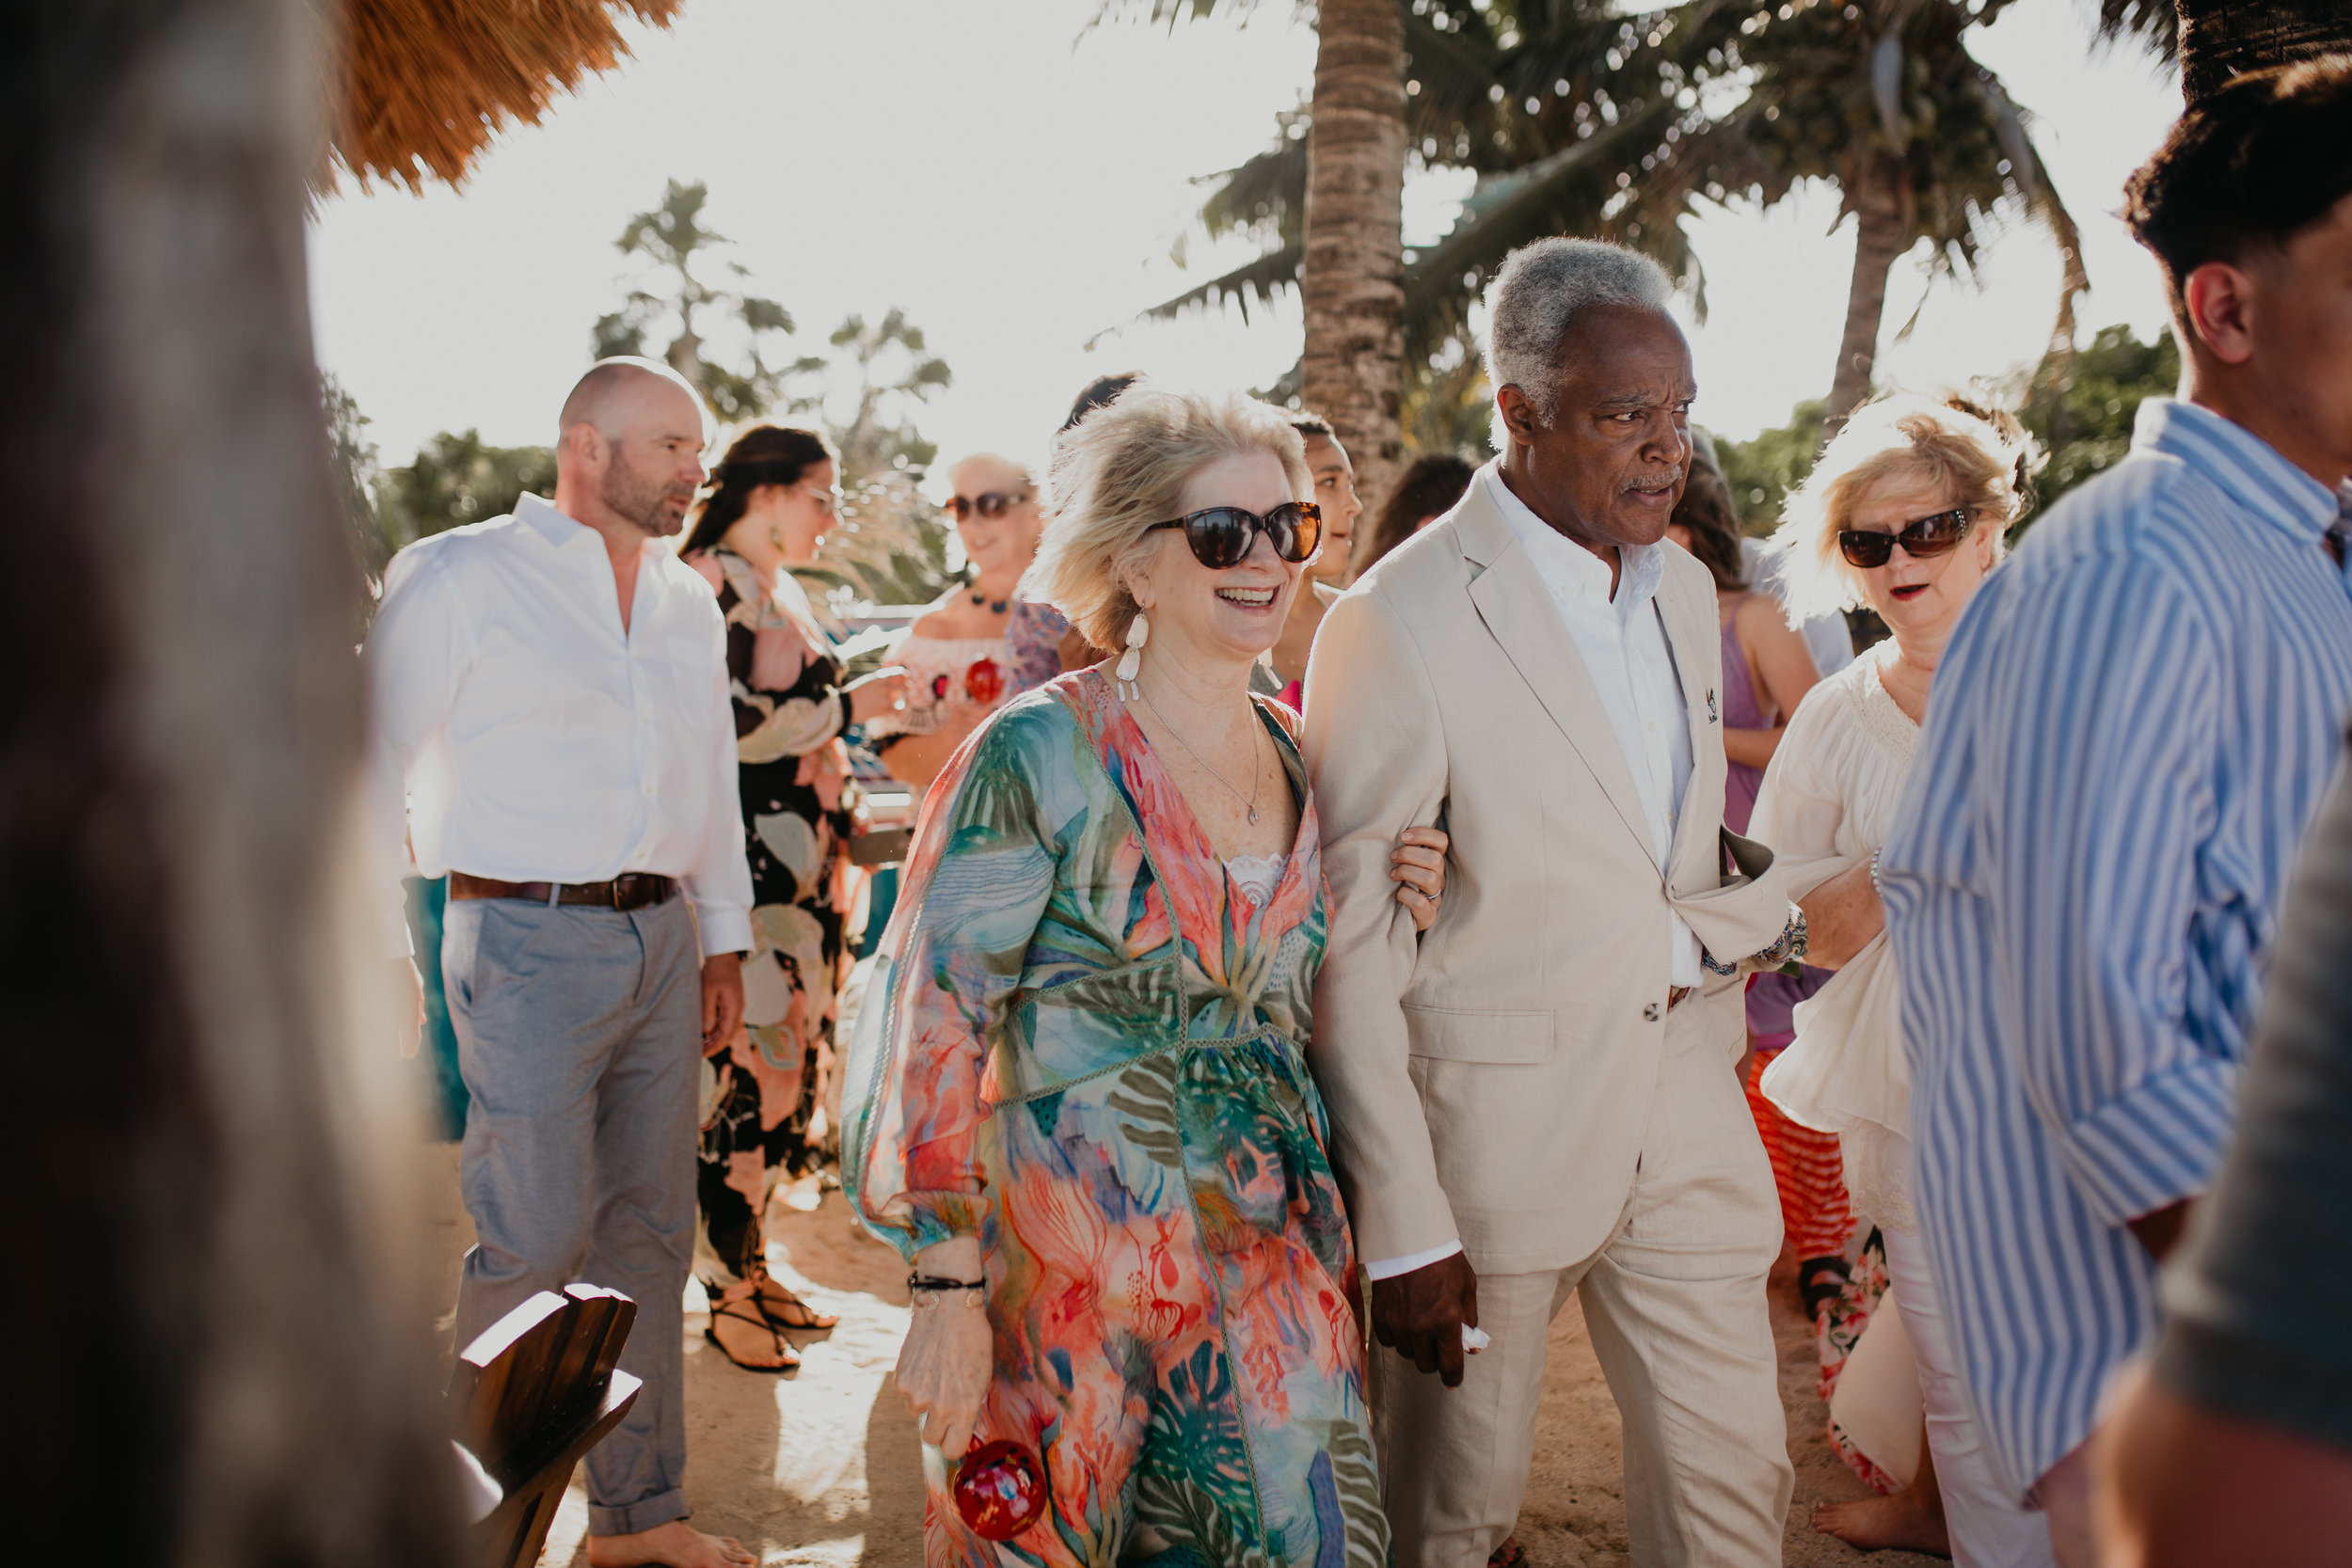 Nicole-Daacke-Photography-beachfront-akumal-destionation-wedding-tulum-mexico-elopement-photographer-destination-wedding-inspiration-sunset-champagne-pop-boho-bride-ocean-tropical-bohemian-tulum-wedding-photos-149.jpg